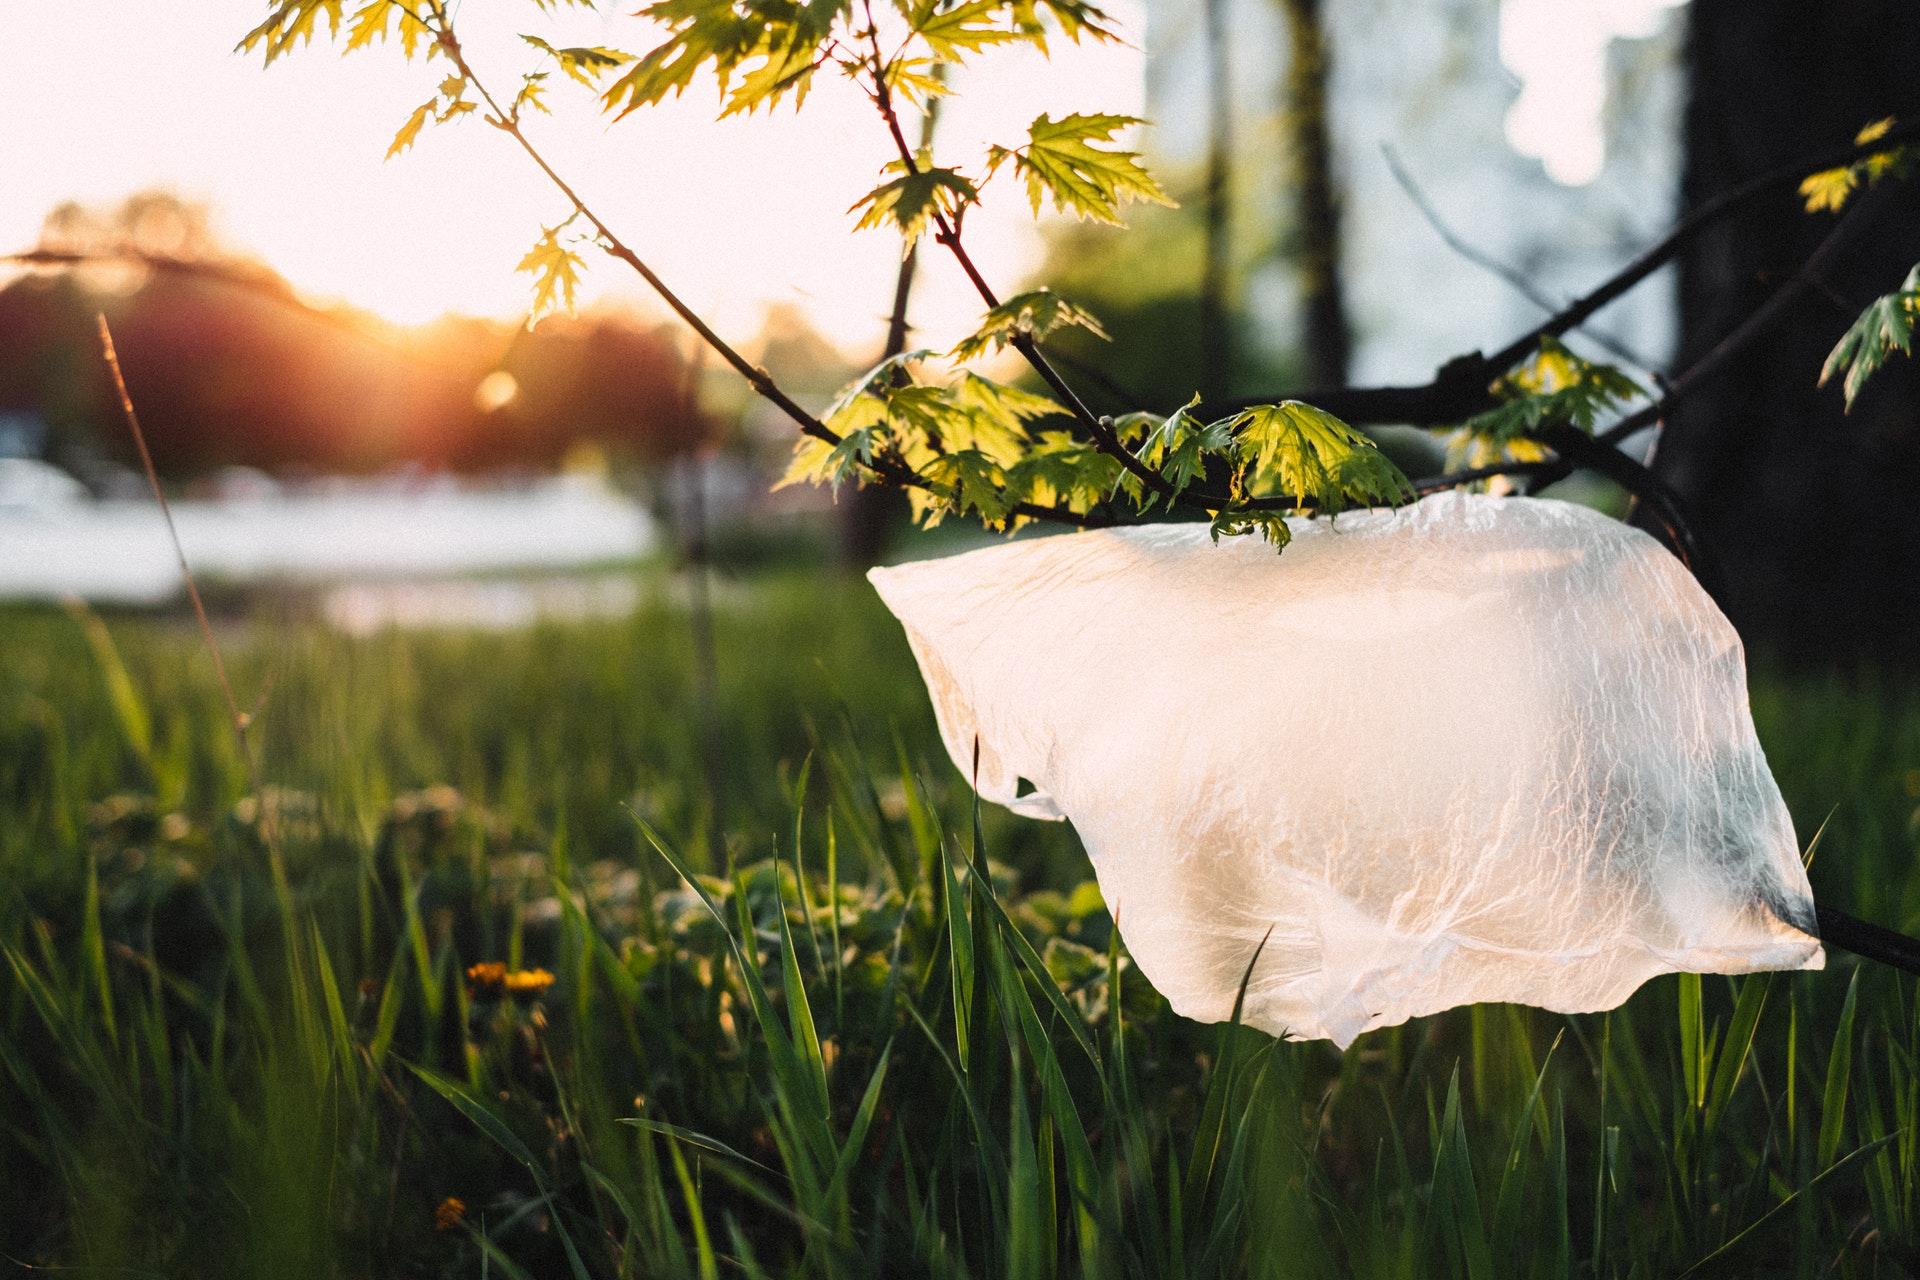 Plastikpose, plastik, forurening, co2